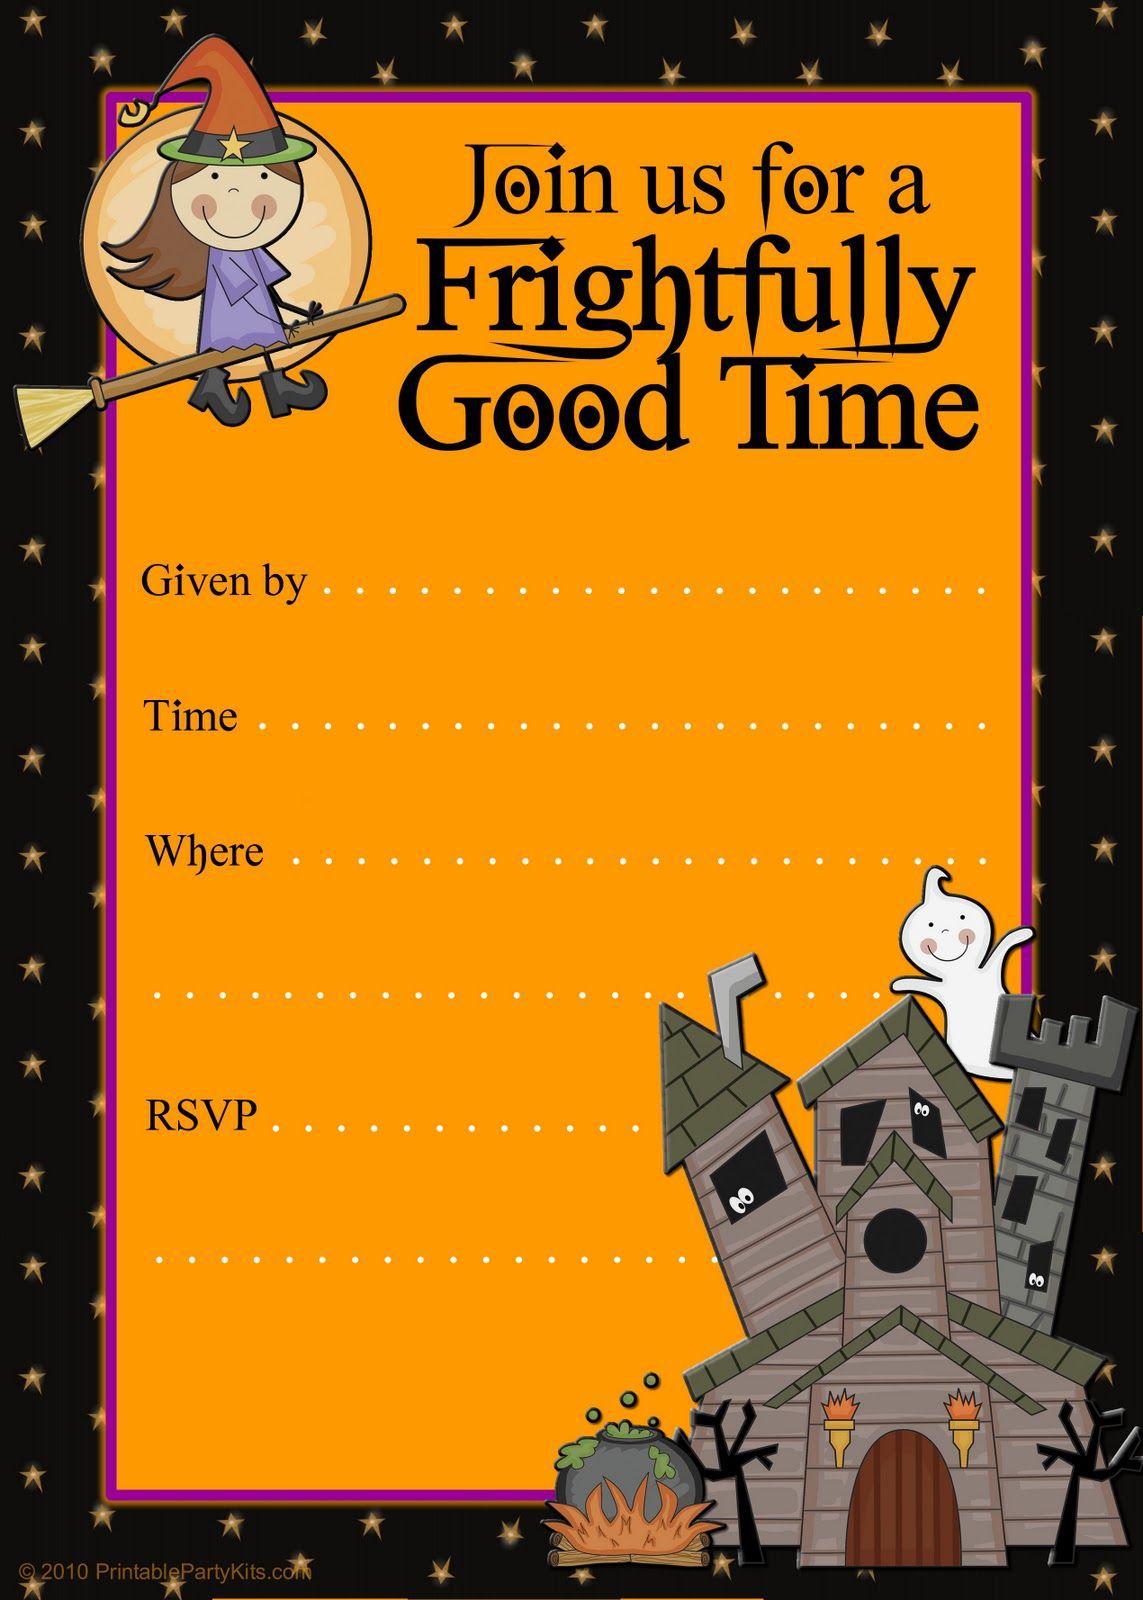 002 Sensational Halloween Party Invitation Template High Def  Microsoft Block OctoberFull